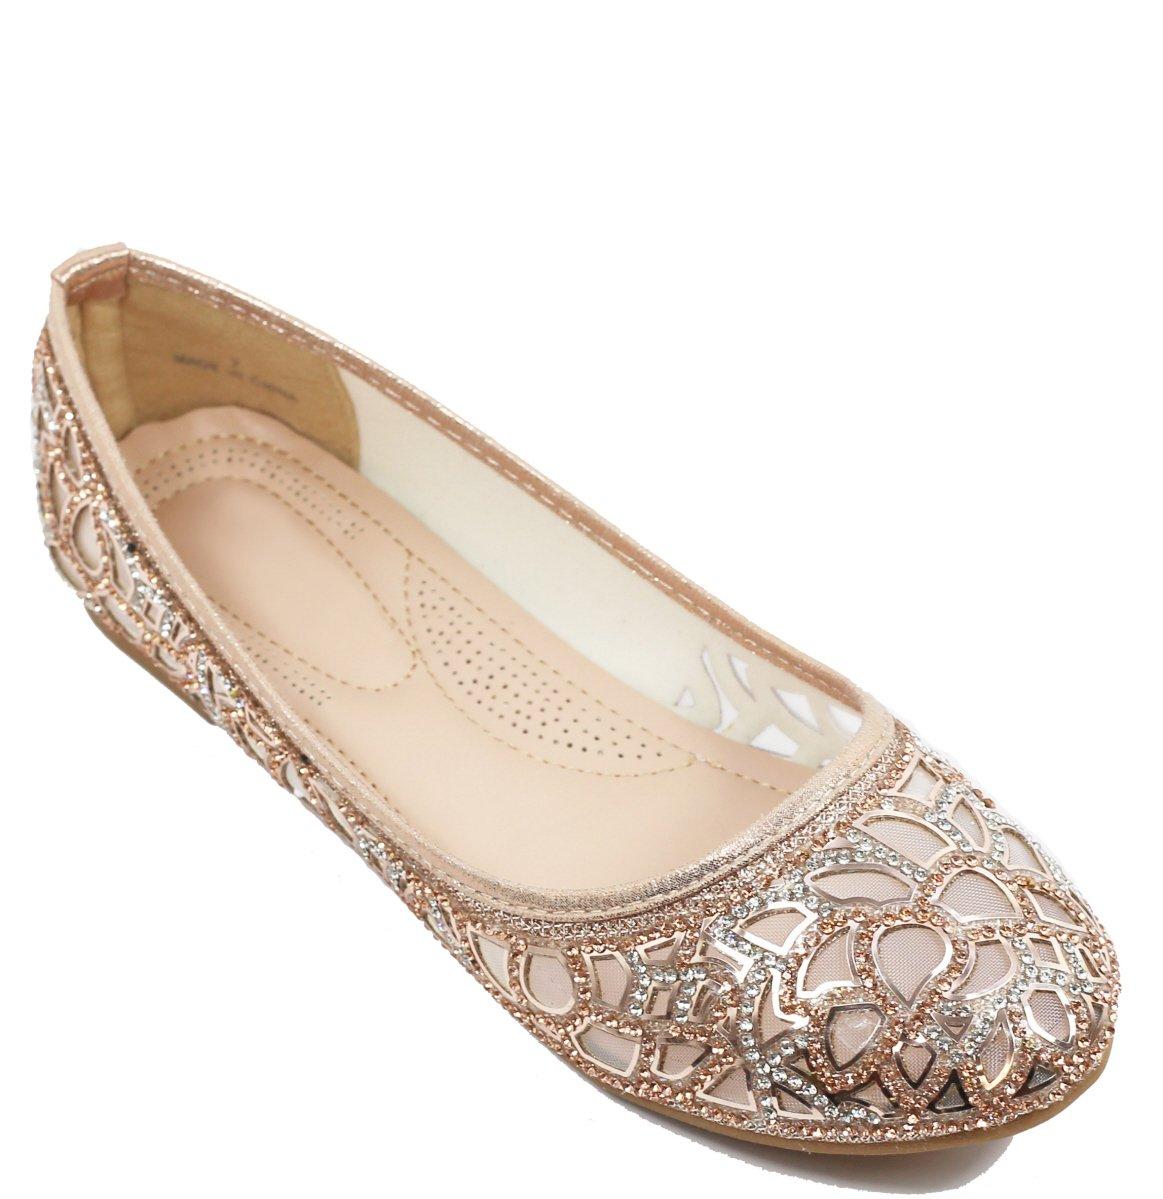 Walstar Women Rhinestone Flats Glitter Mesh Flats Slip on Shoes B071YT4QQZ 8.5 B(M) US Mesh-rose Gold